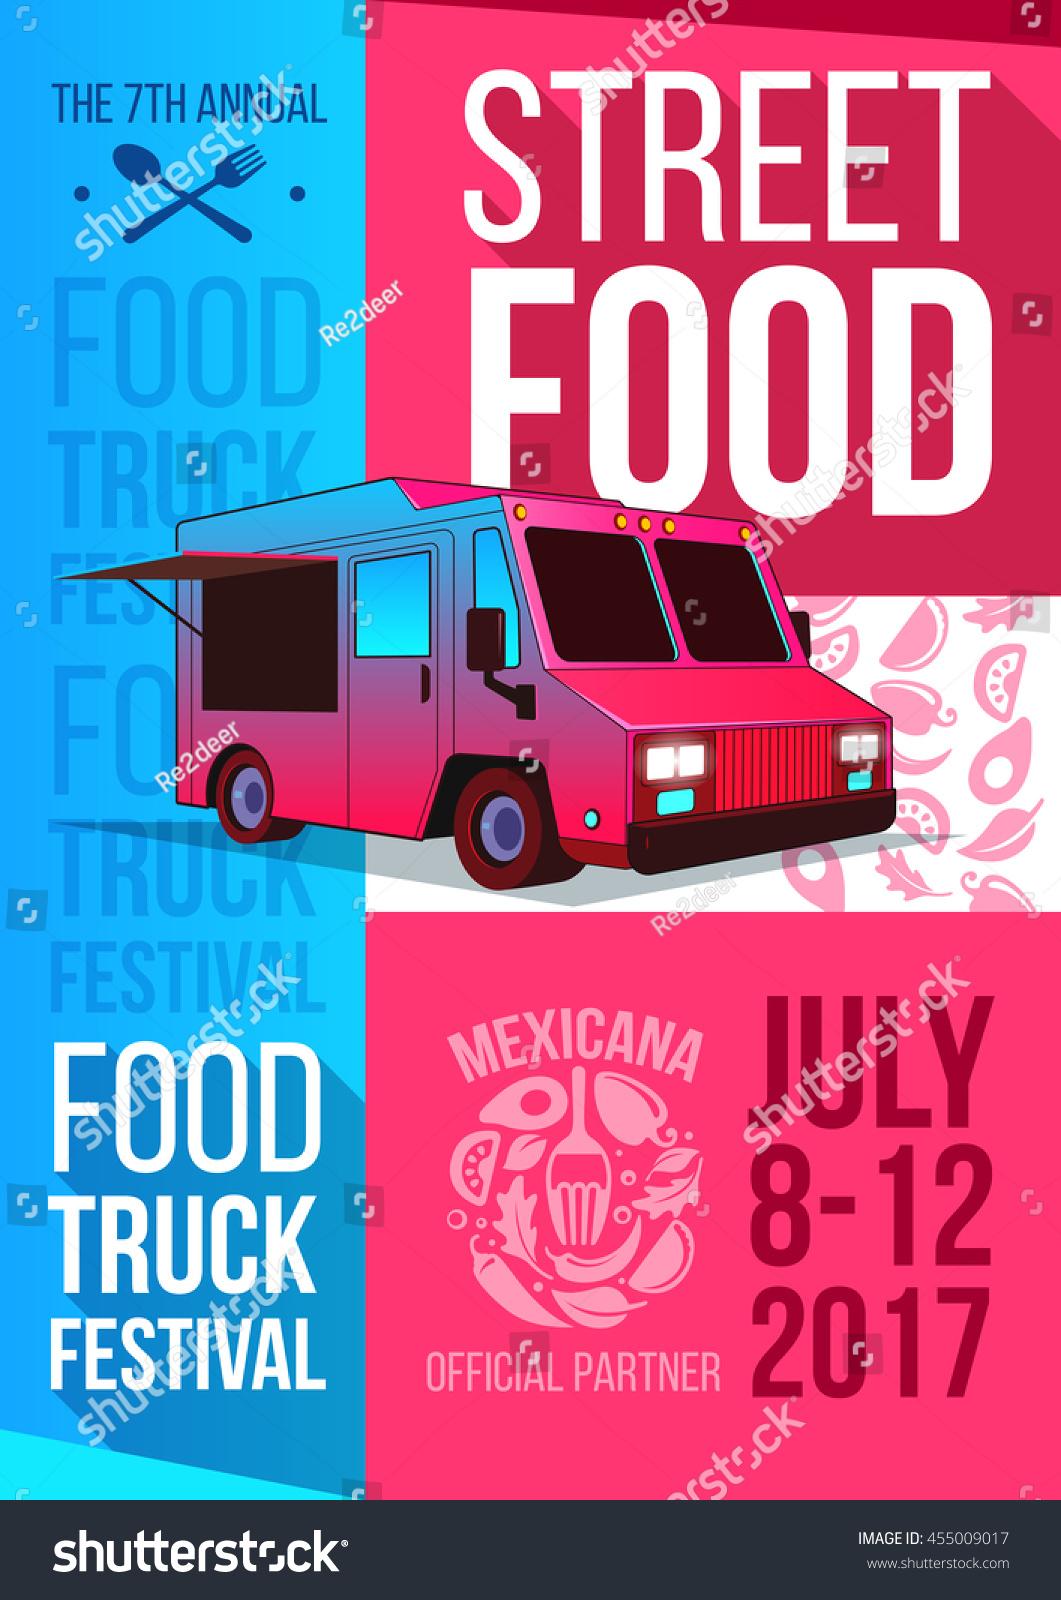 food truck festival food brochure vector stock vector 455009017 shutterstock. Black Bedroom Furniture Sets. Home Design Ideas